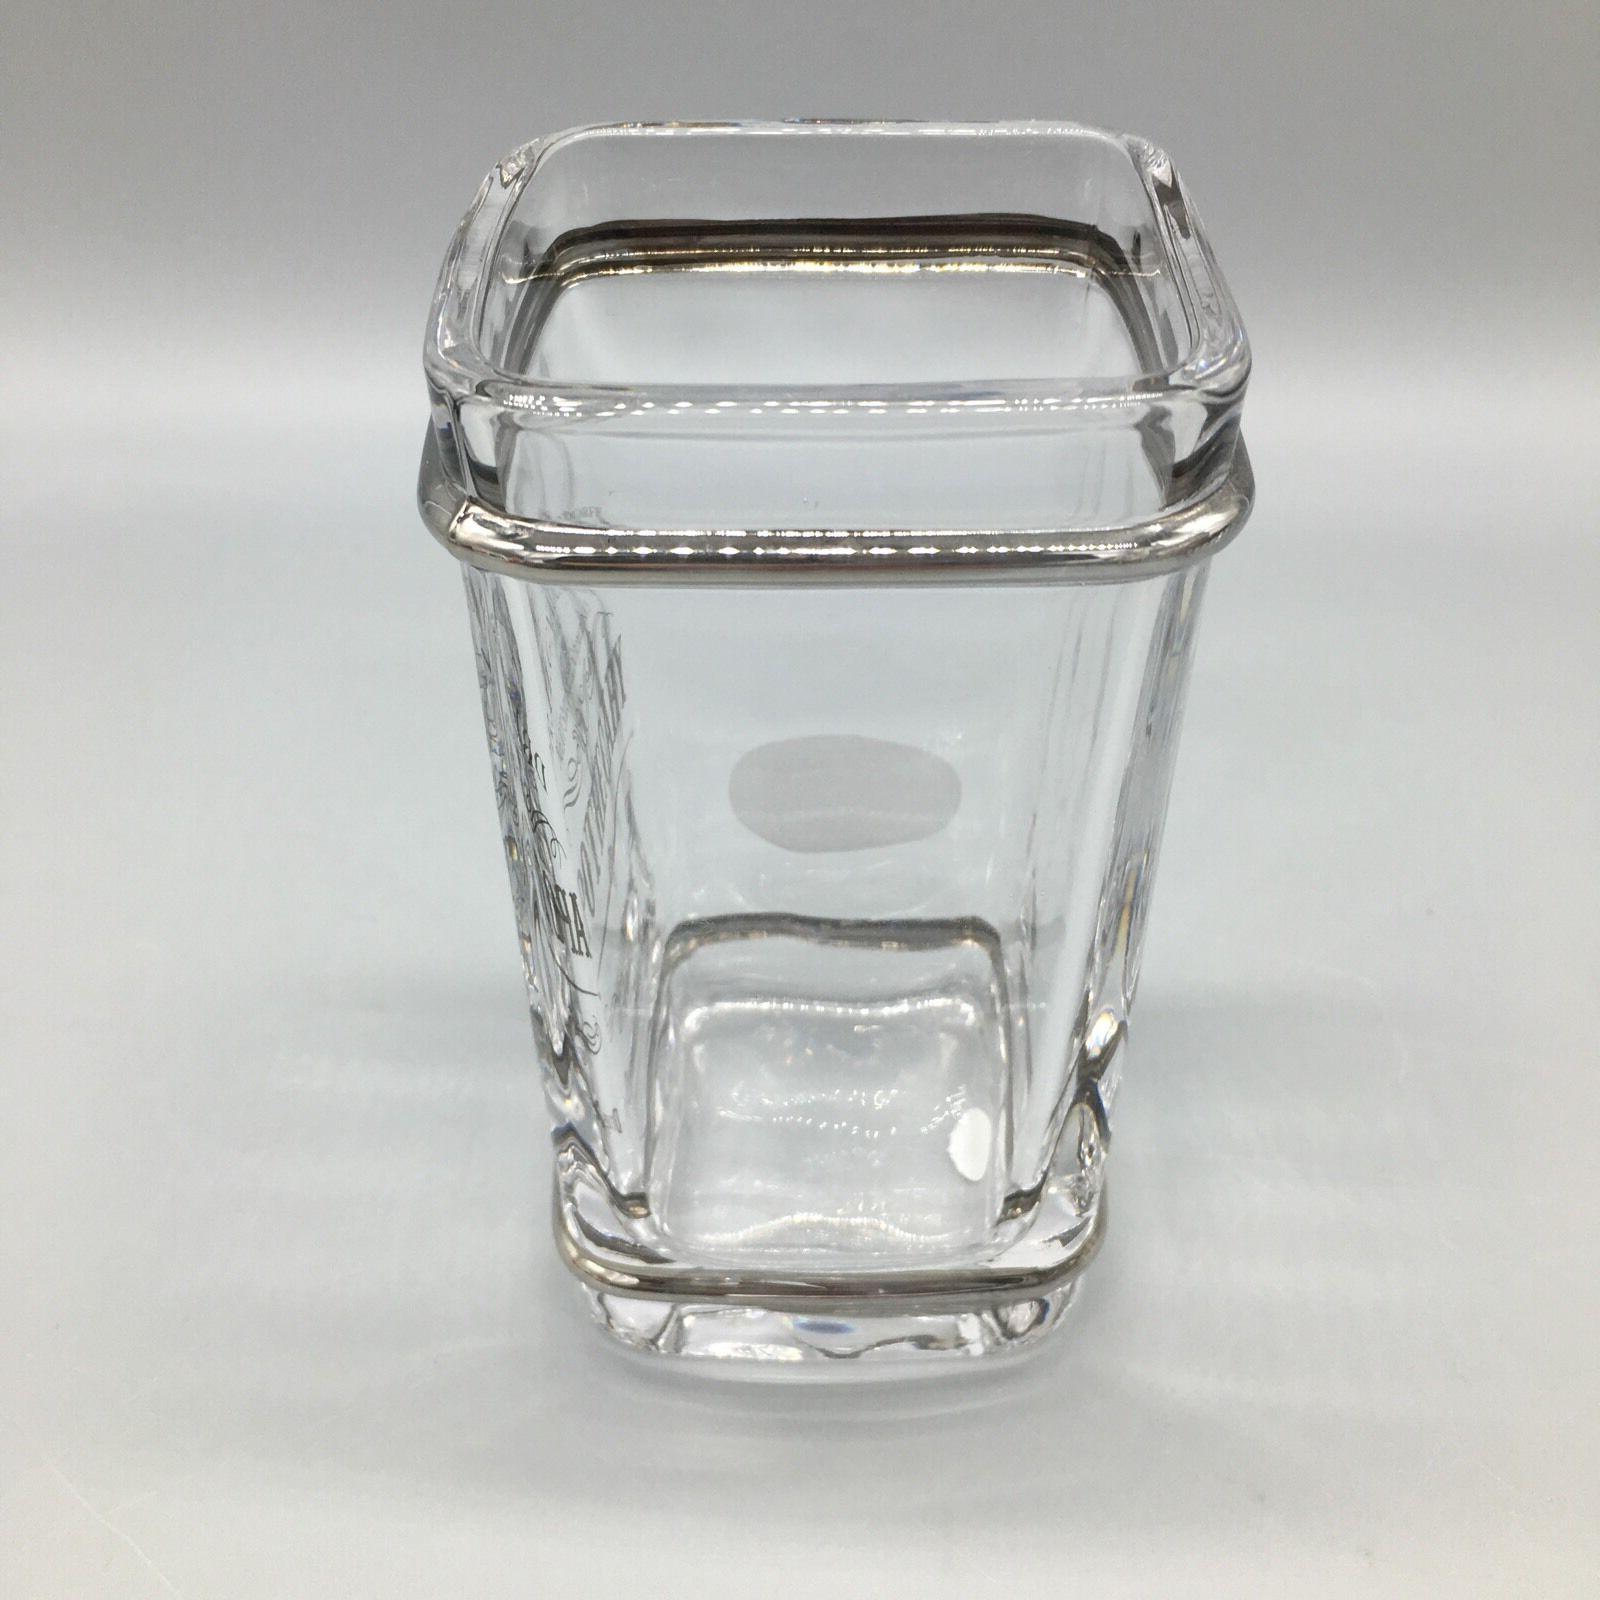 BELLA Dr Gnadendorff Glass Toothbrush Holder